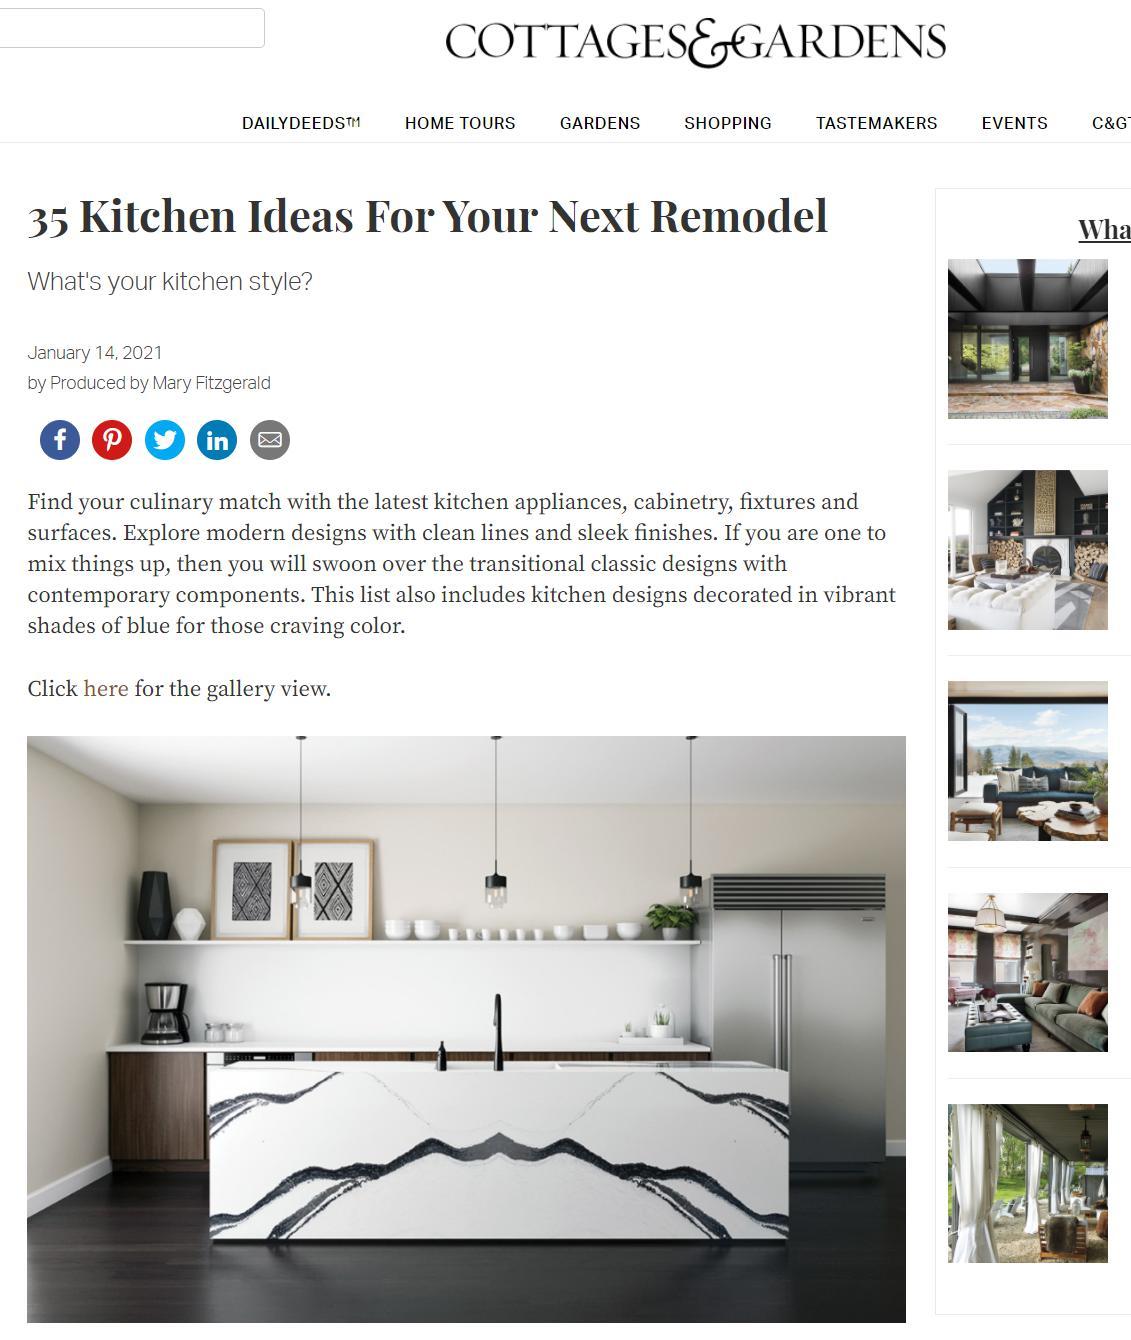 Connecticut Cottages & Gardens Online - January 14, 2021